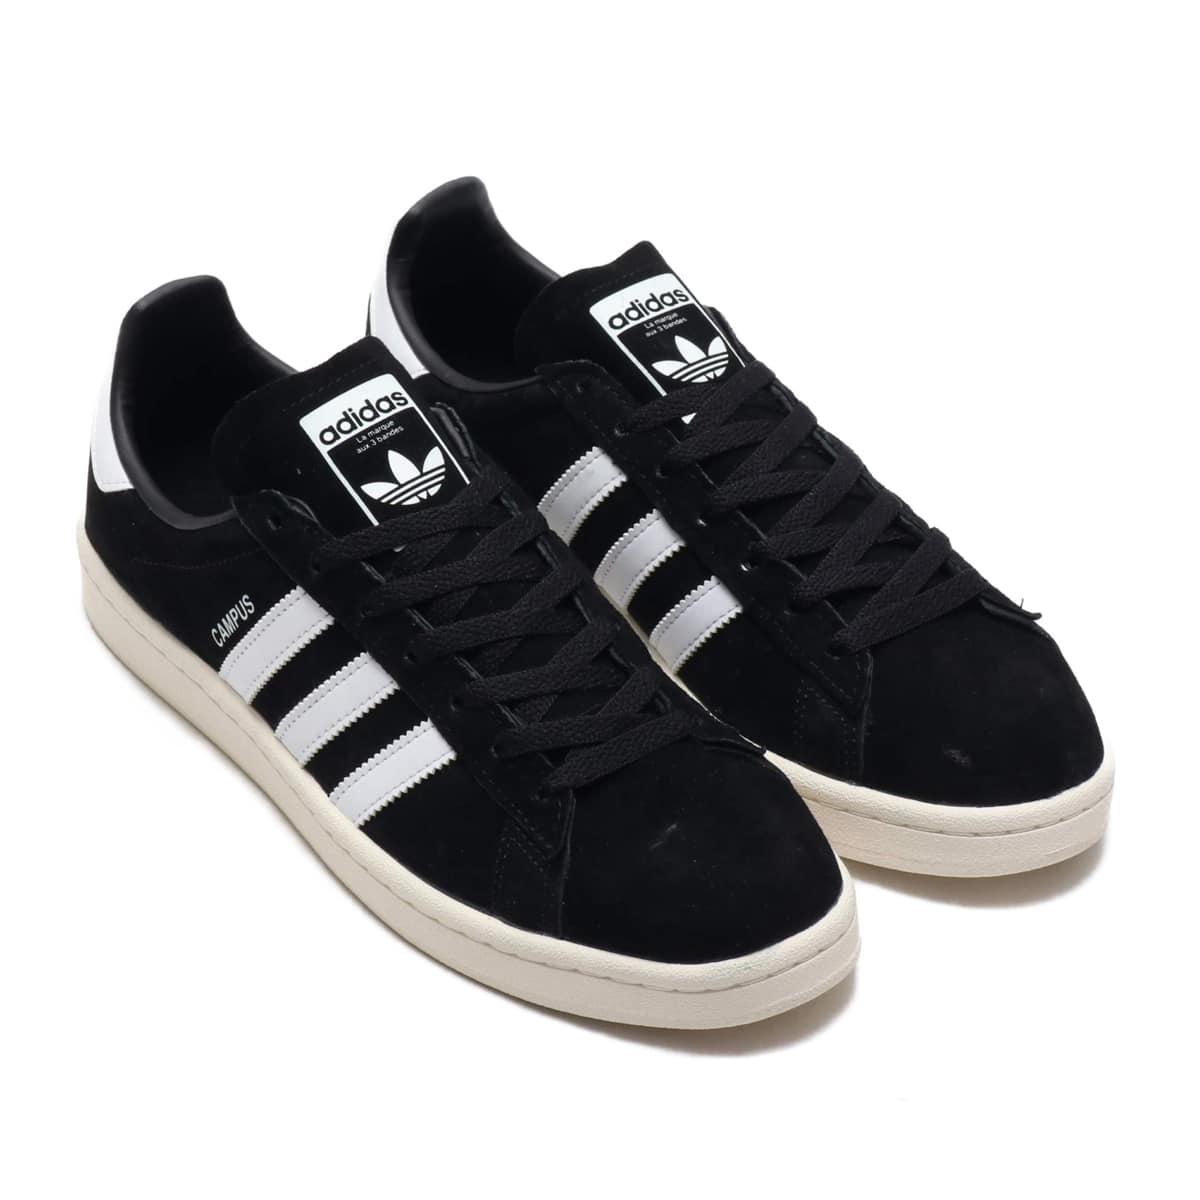 adidas Originals CAMPUS Core Black/Running White/Chalk White_photo_large